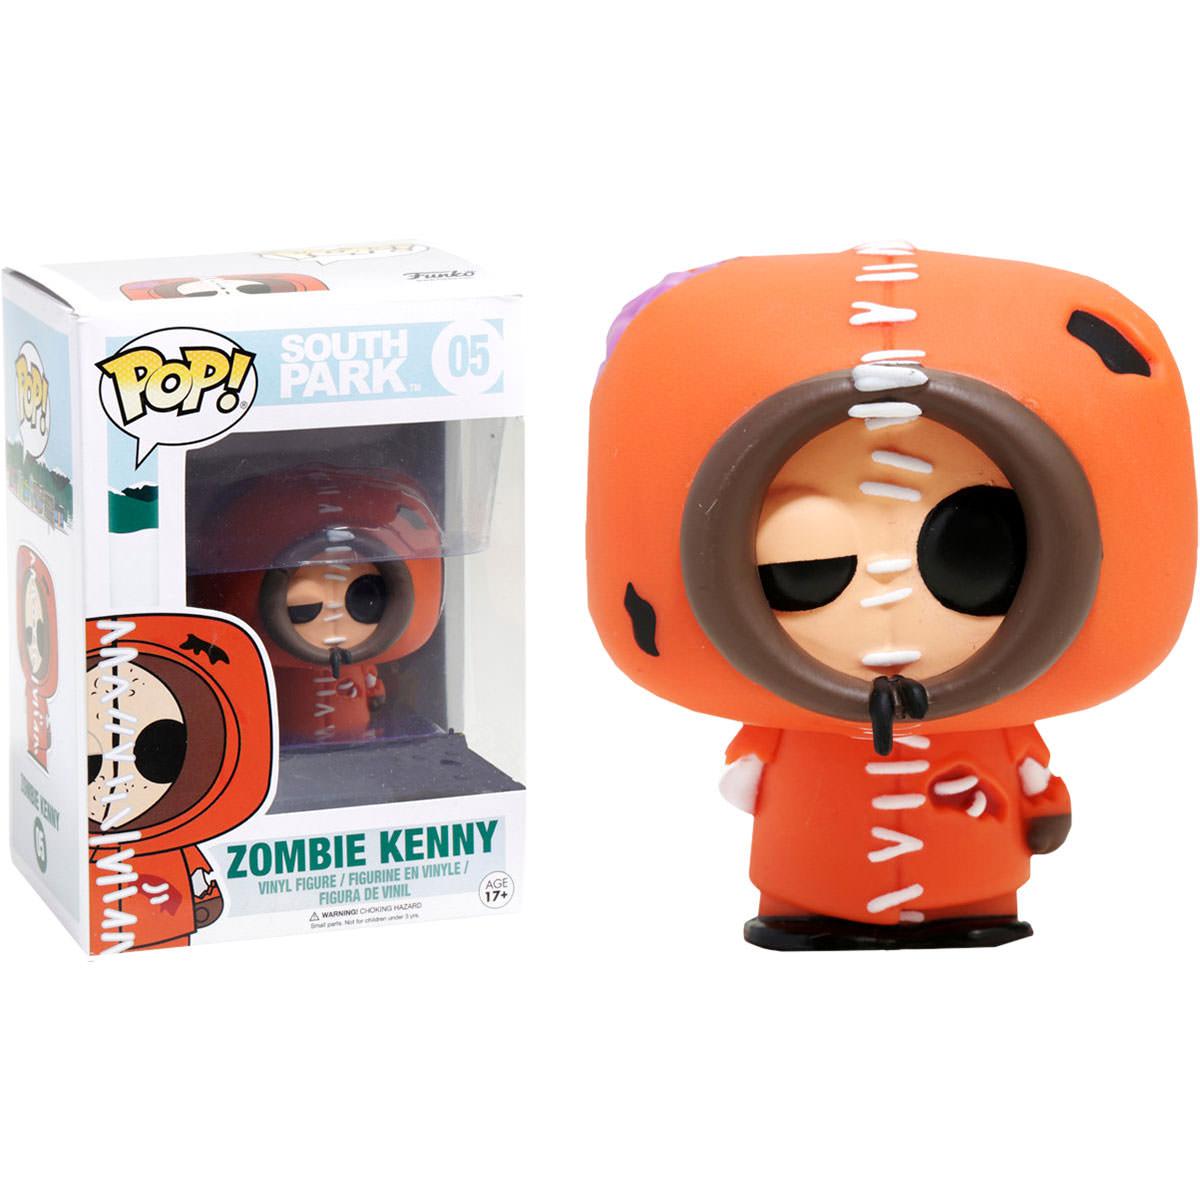 Funko South Park